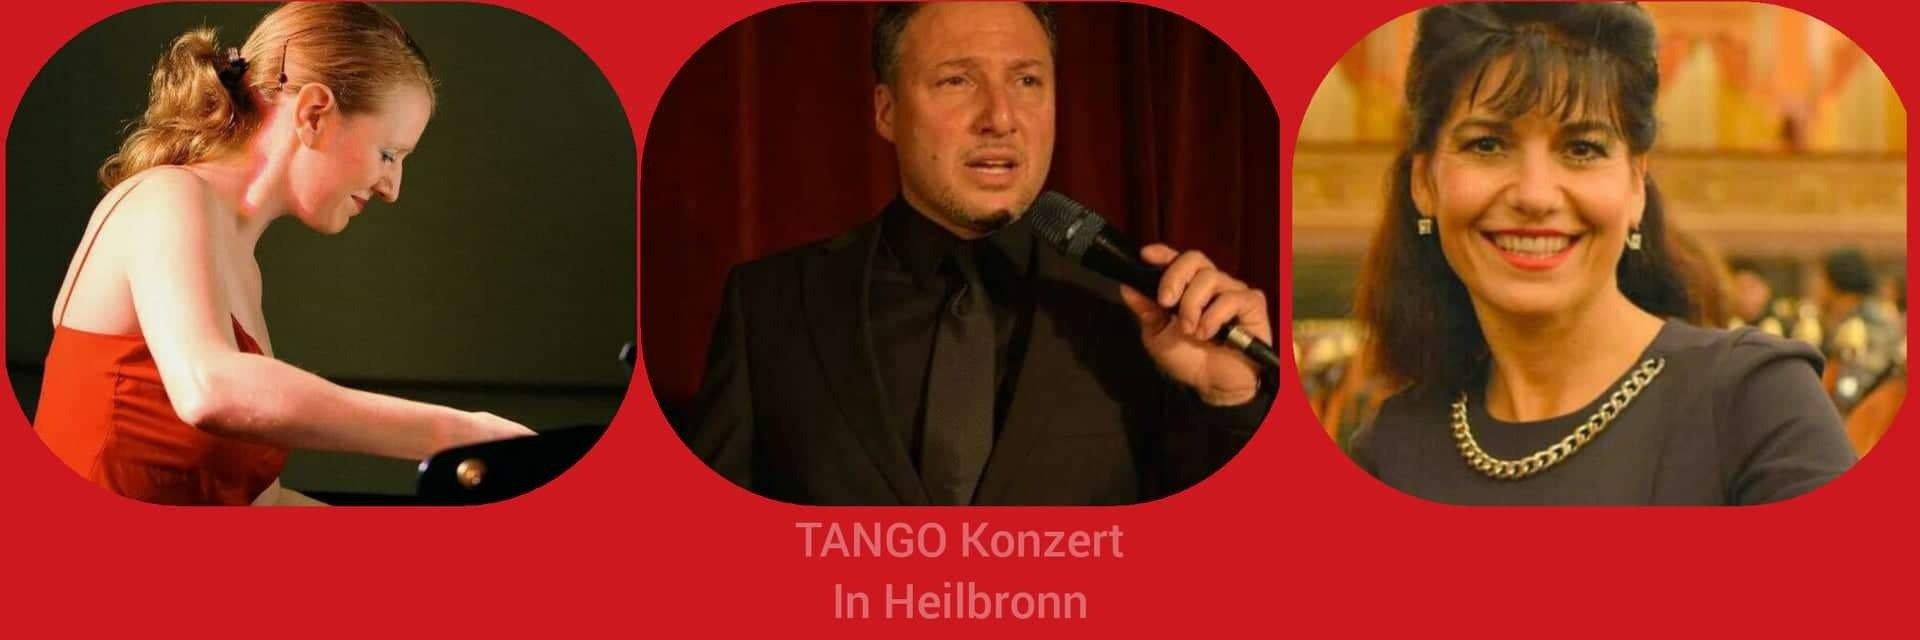 Tangokonzert mit Judy Ruks & Marcelo Paletta